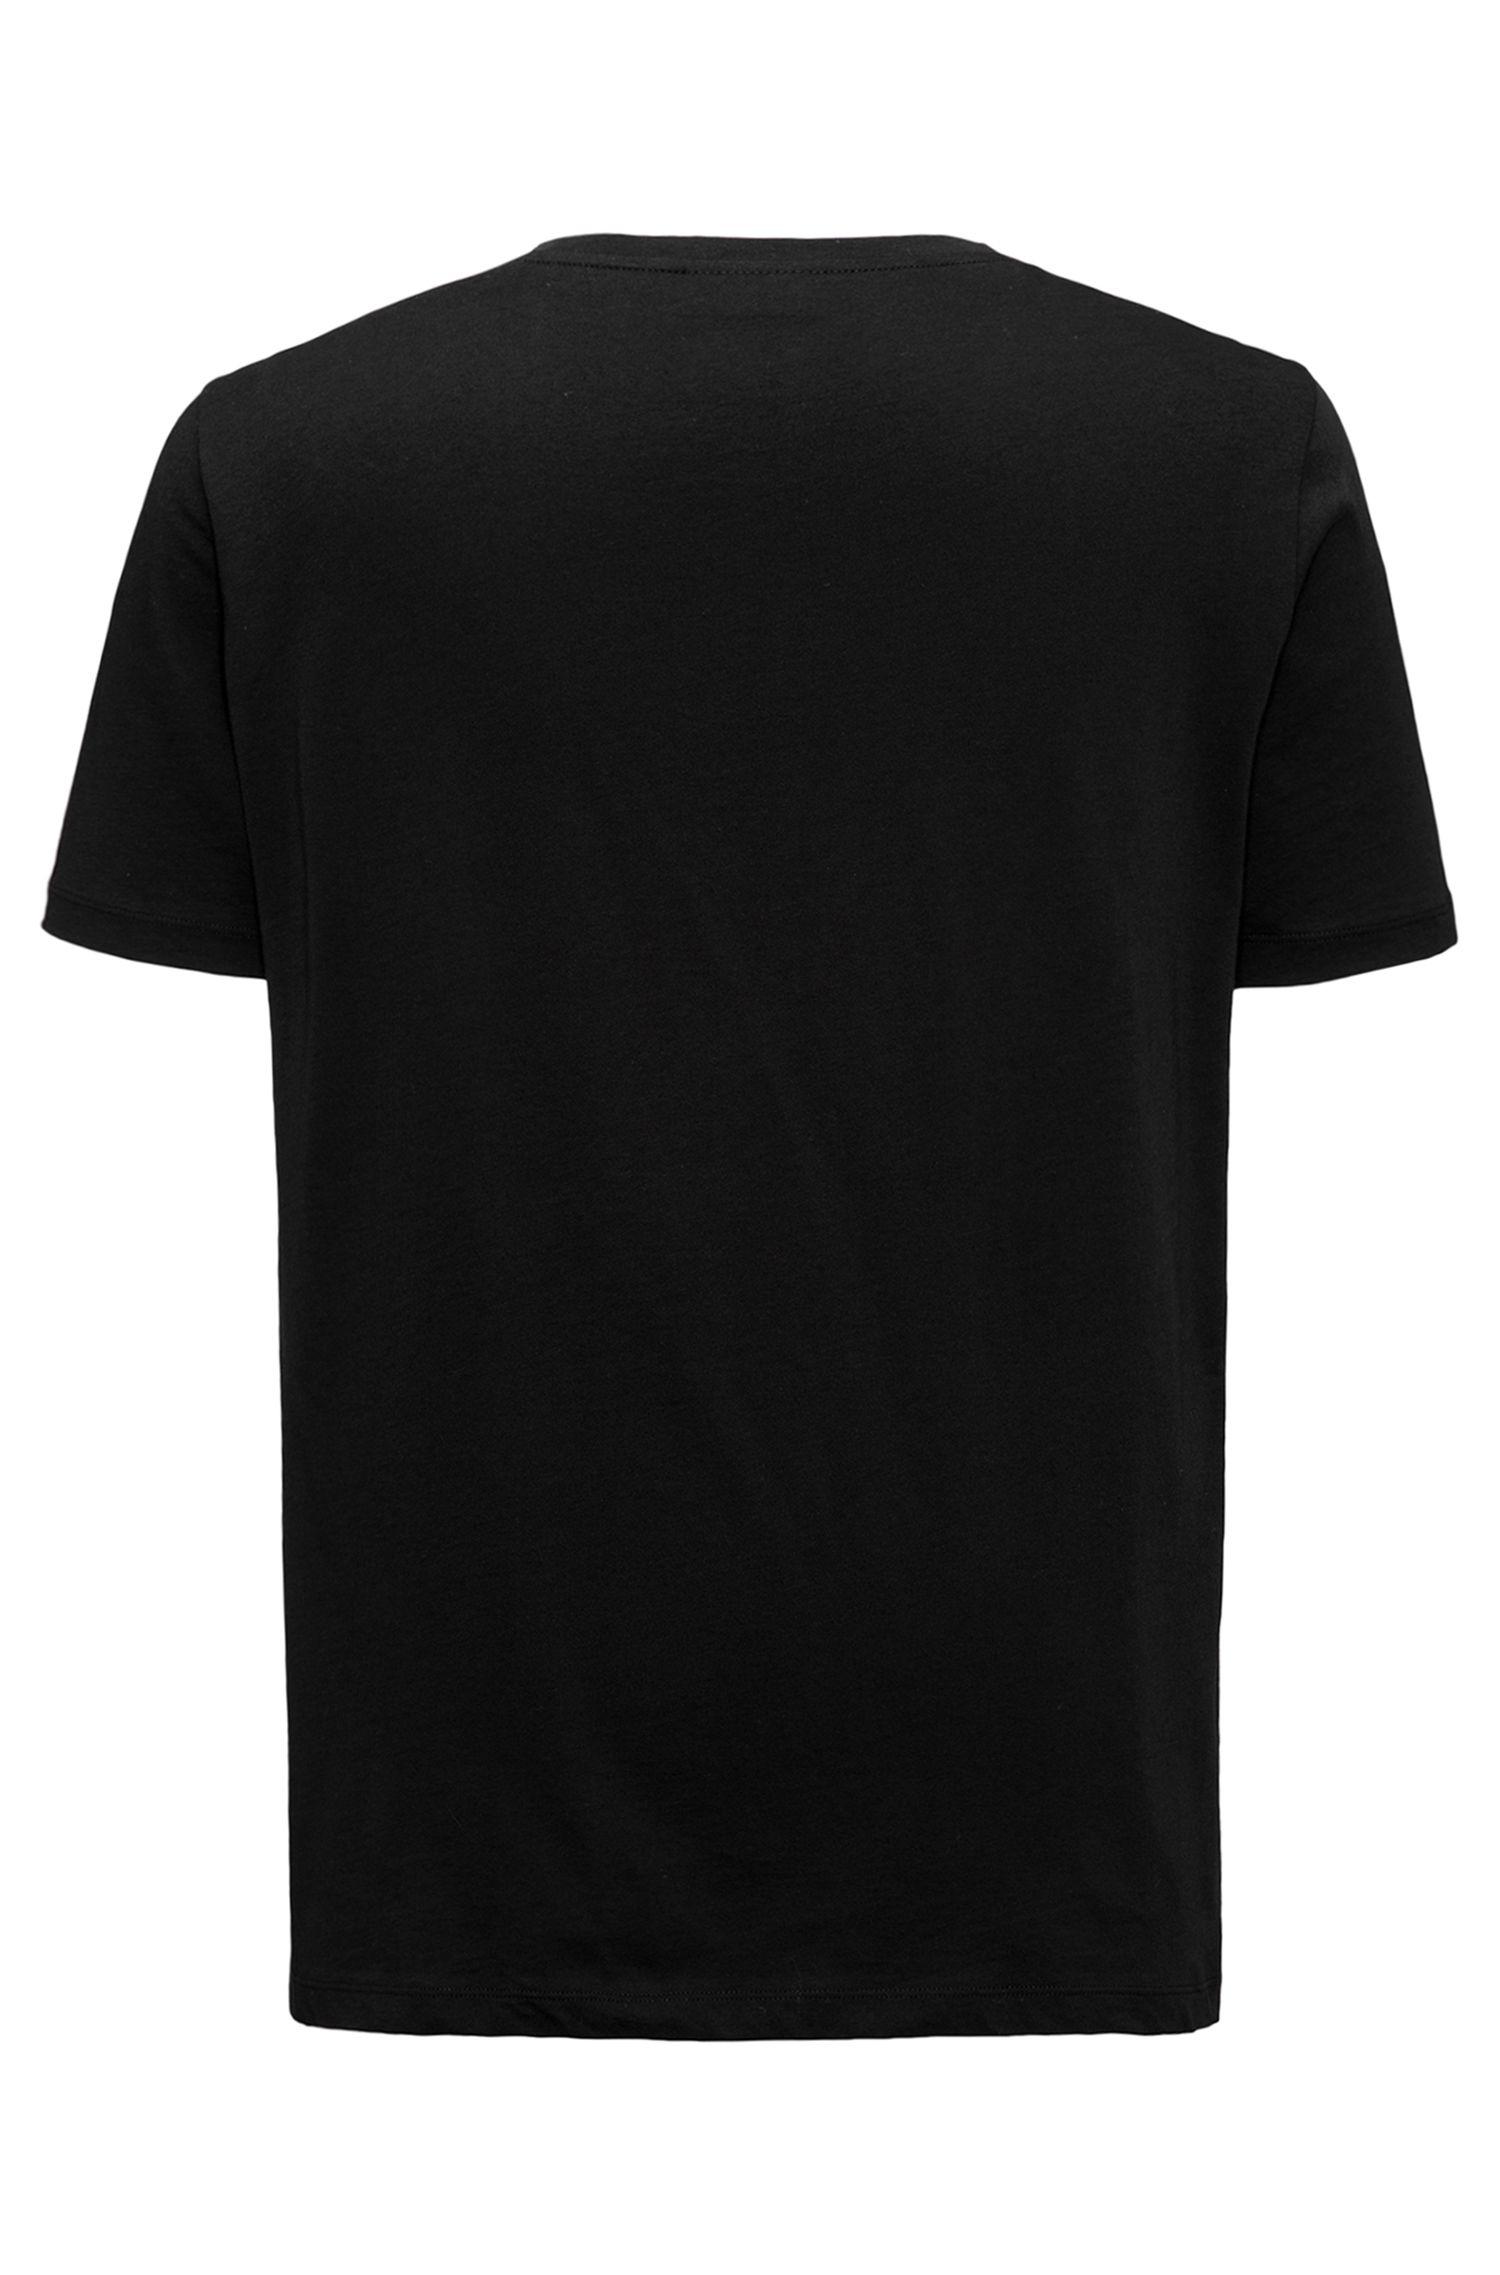 Logo Graphic T-Shirt | Daws